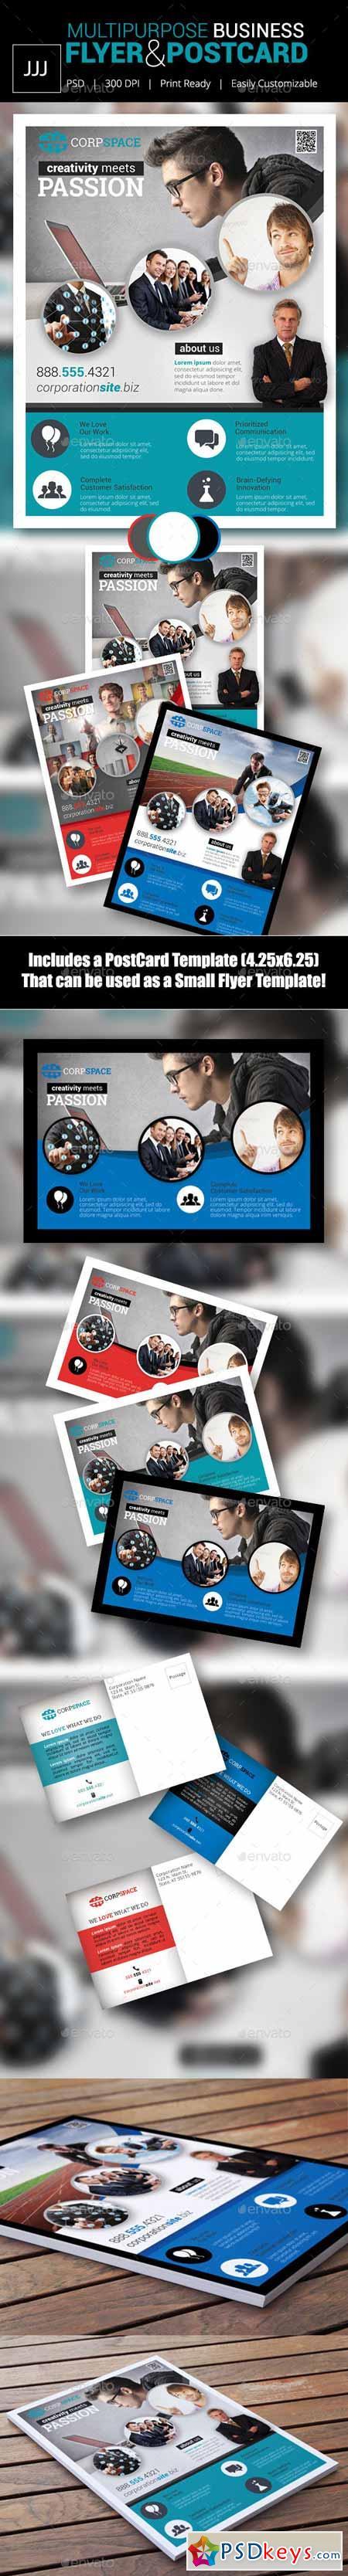 business flyer 40 postcard 8826116 photoshop business flyer 40 postcard 8826116